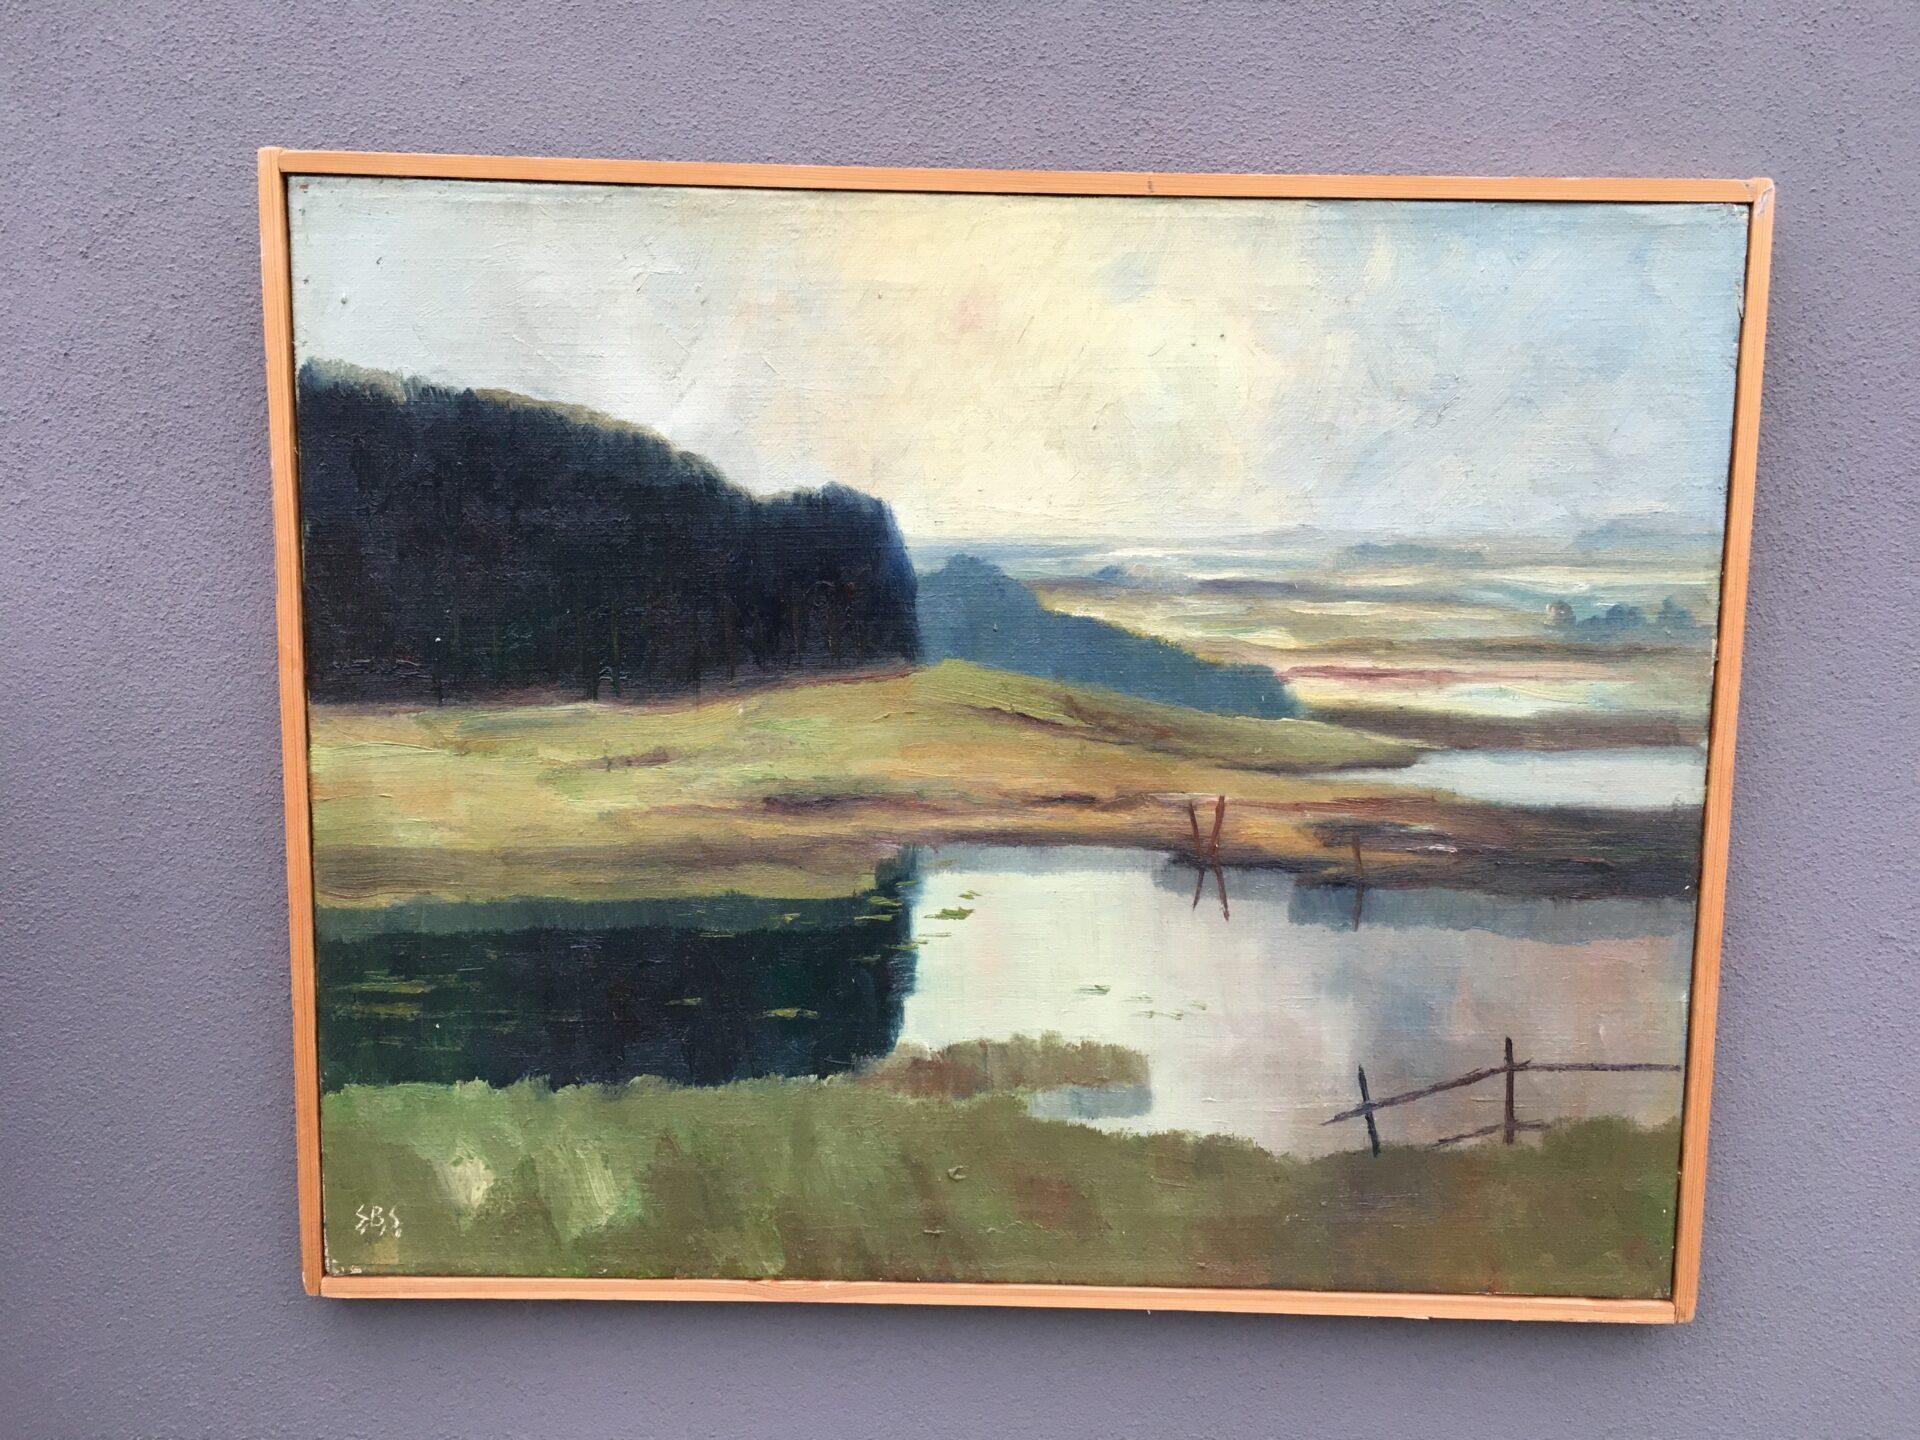 Maleri, Sv. Bertehlsen, Stenvig, 1949,